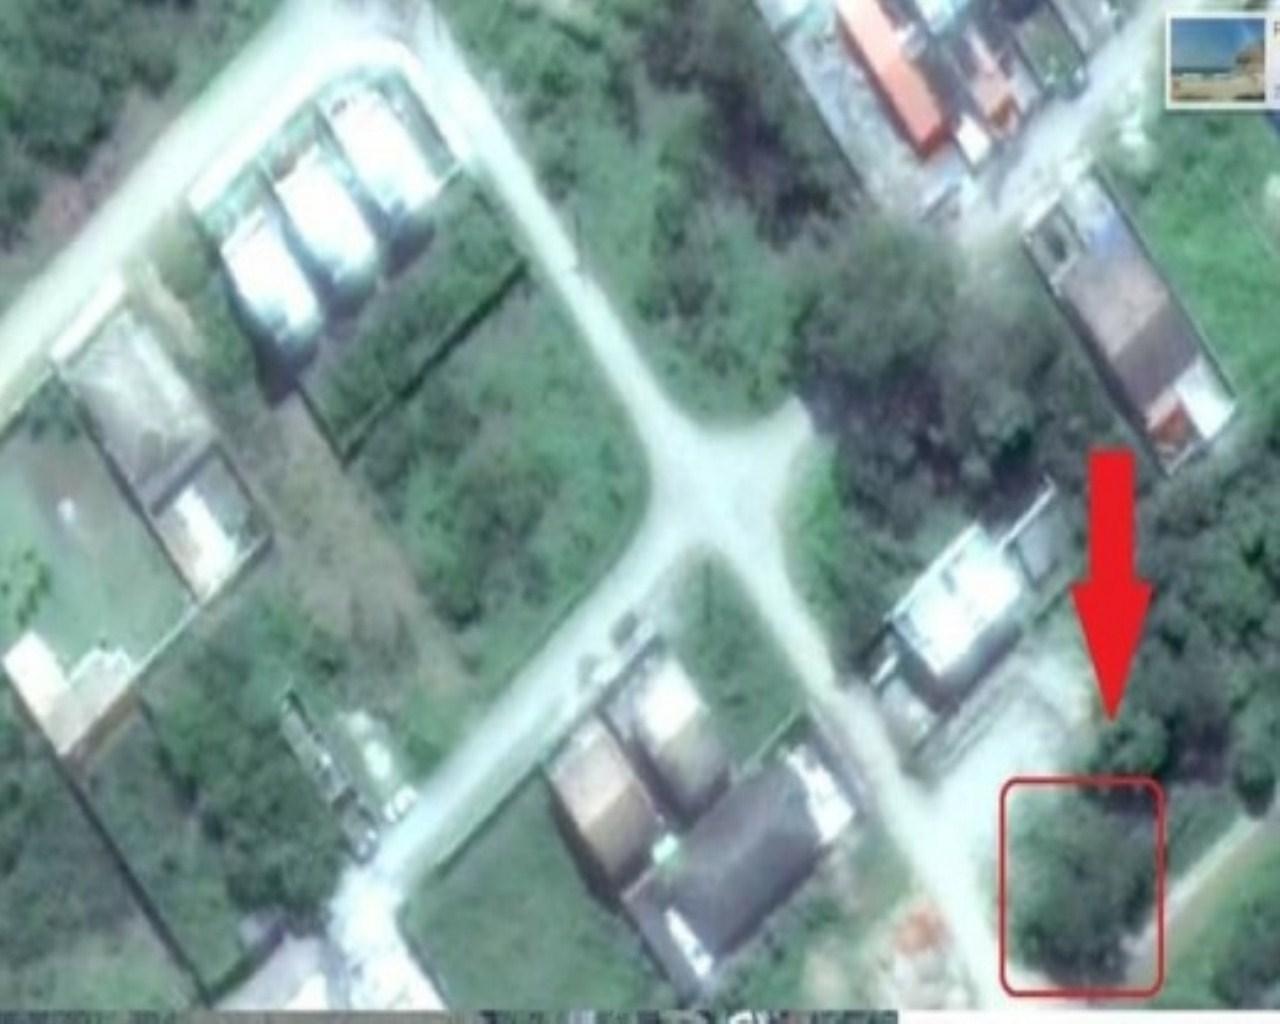 Lote/Terreno em Pontal (Cunhambebe)  -  Angra dos Reis - RJ